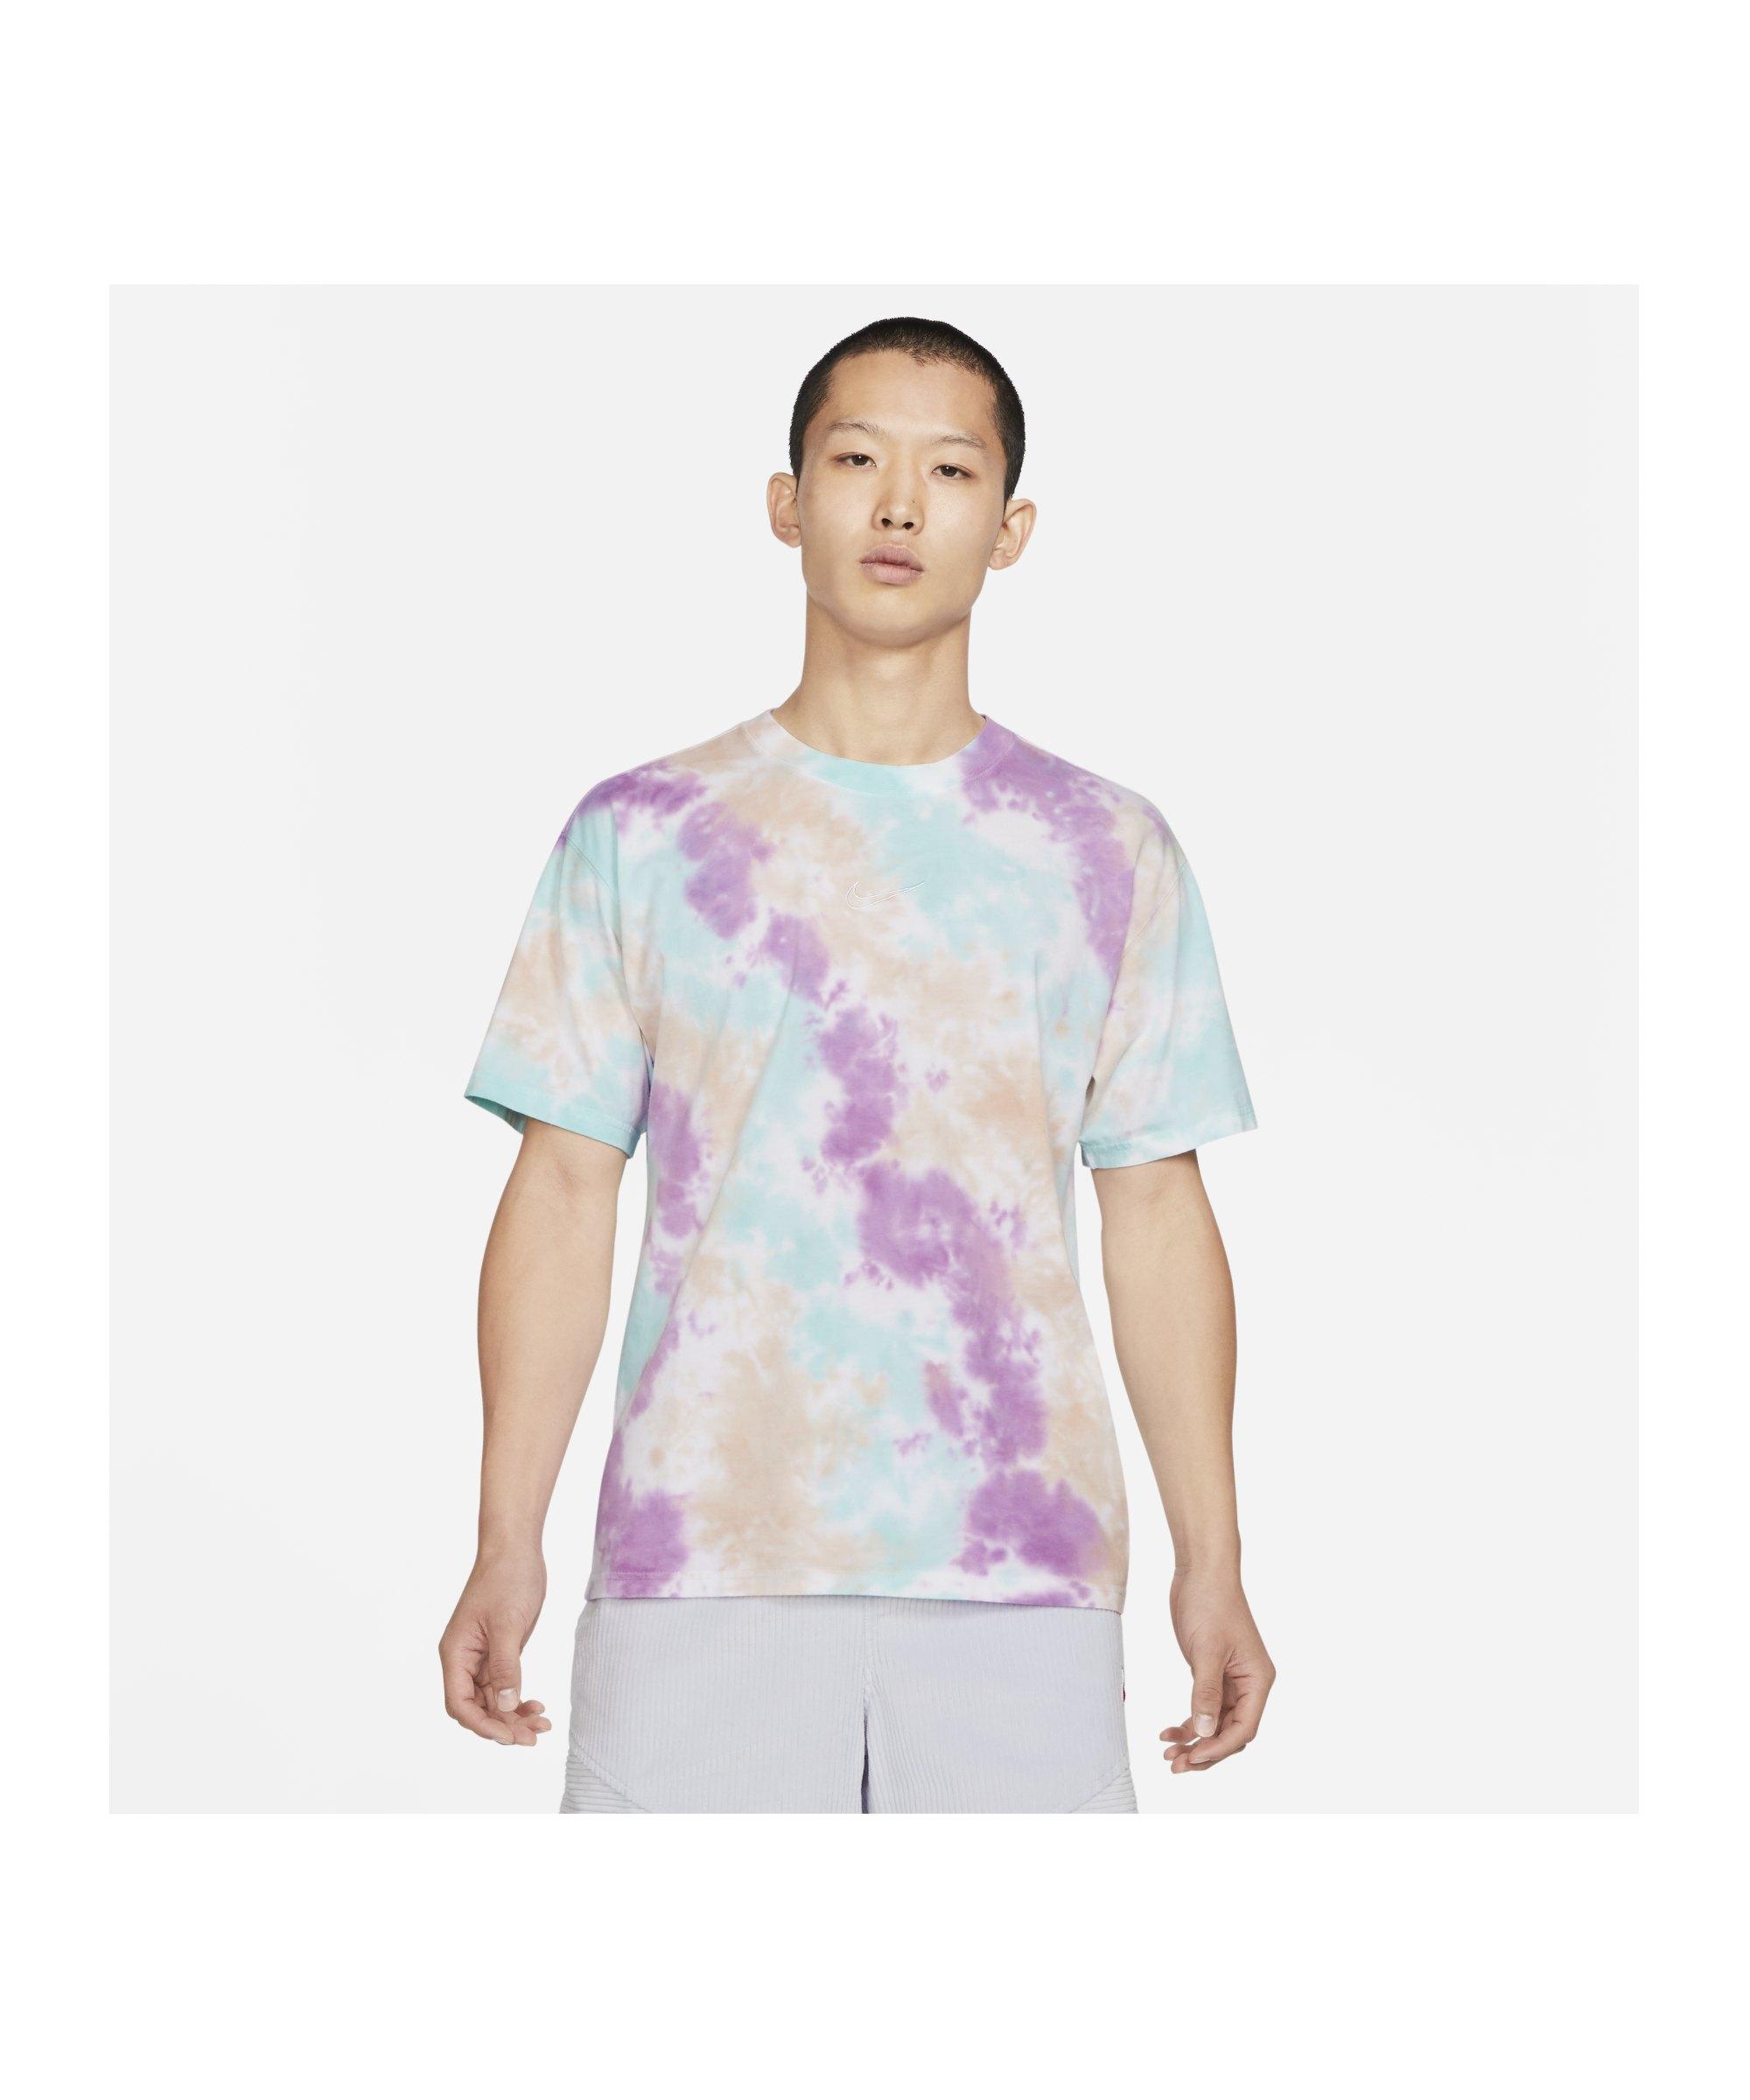 Nike Max 90 Wild Tie Dye T-Shirt Weiss Grau F100 - weiss